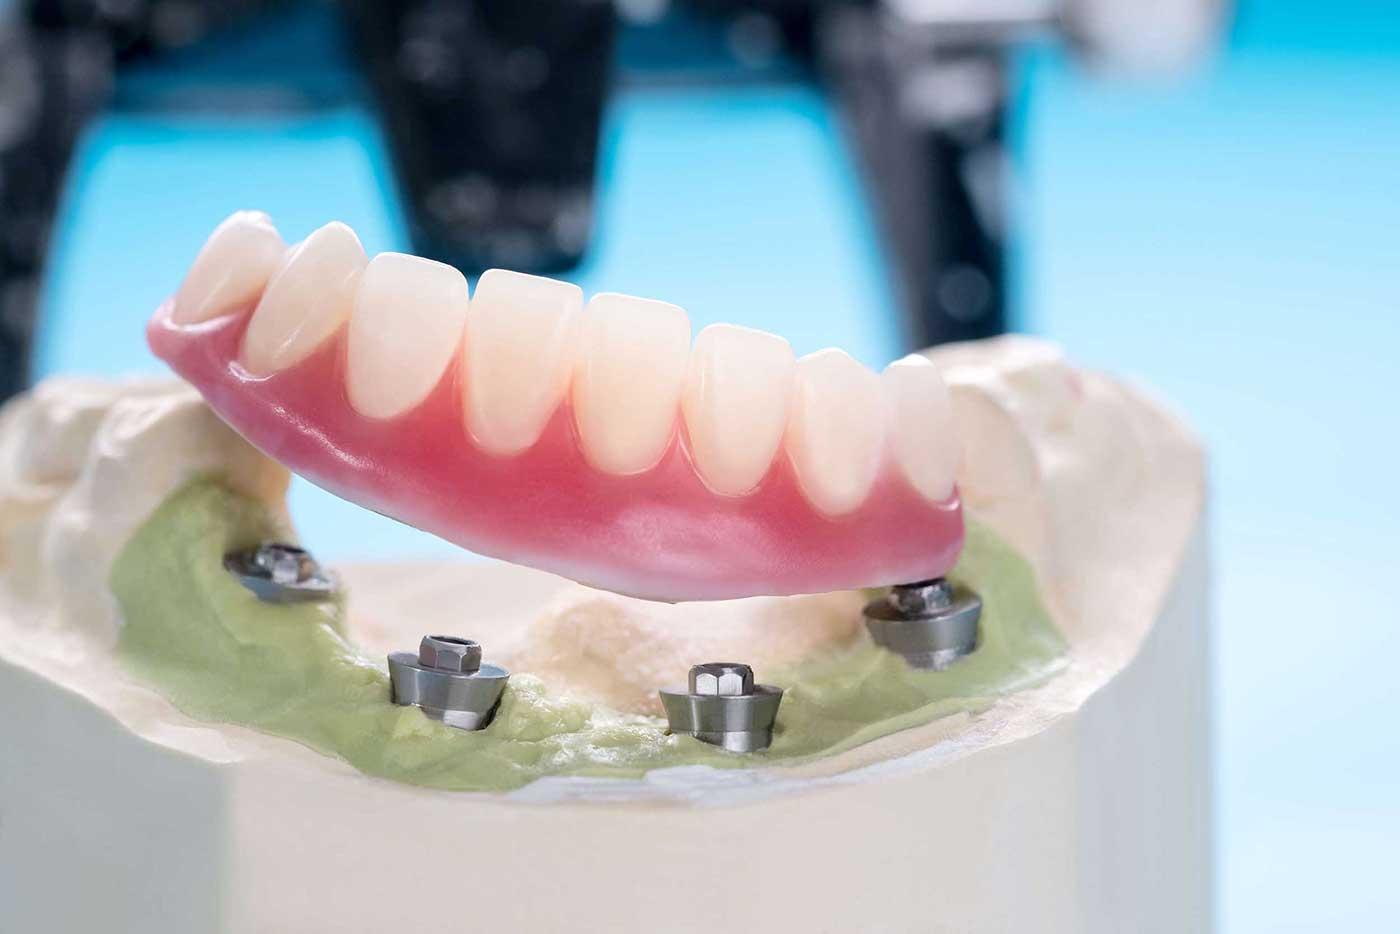 Implant-Supported Dentures in Glendive MT